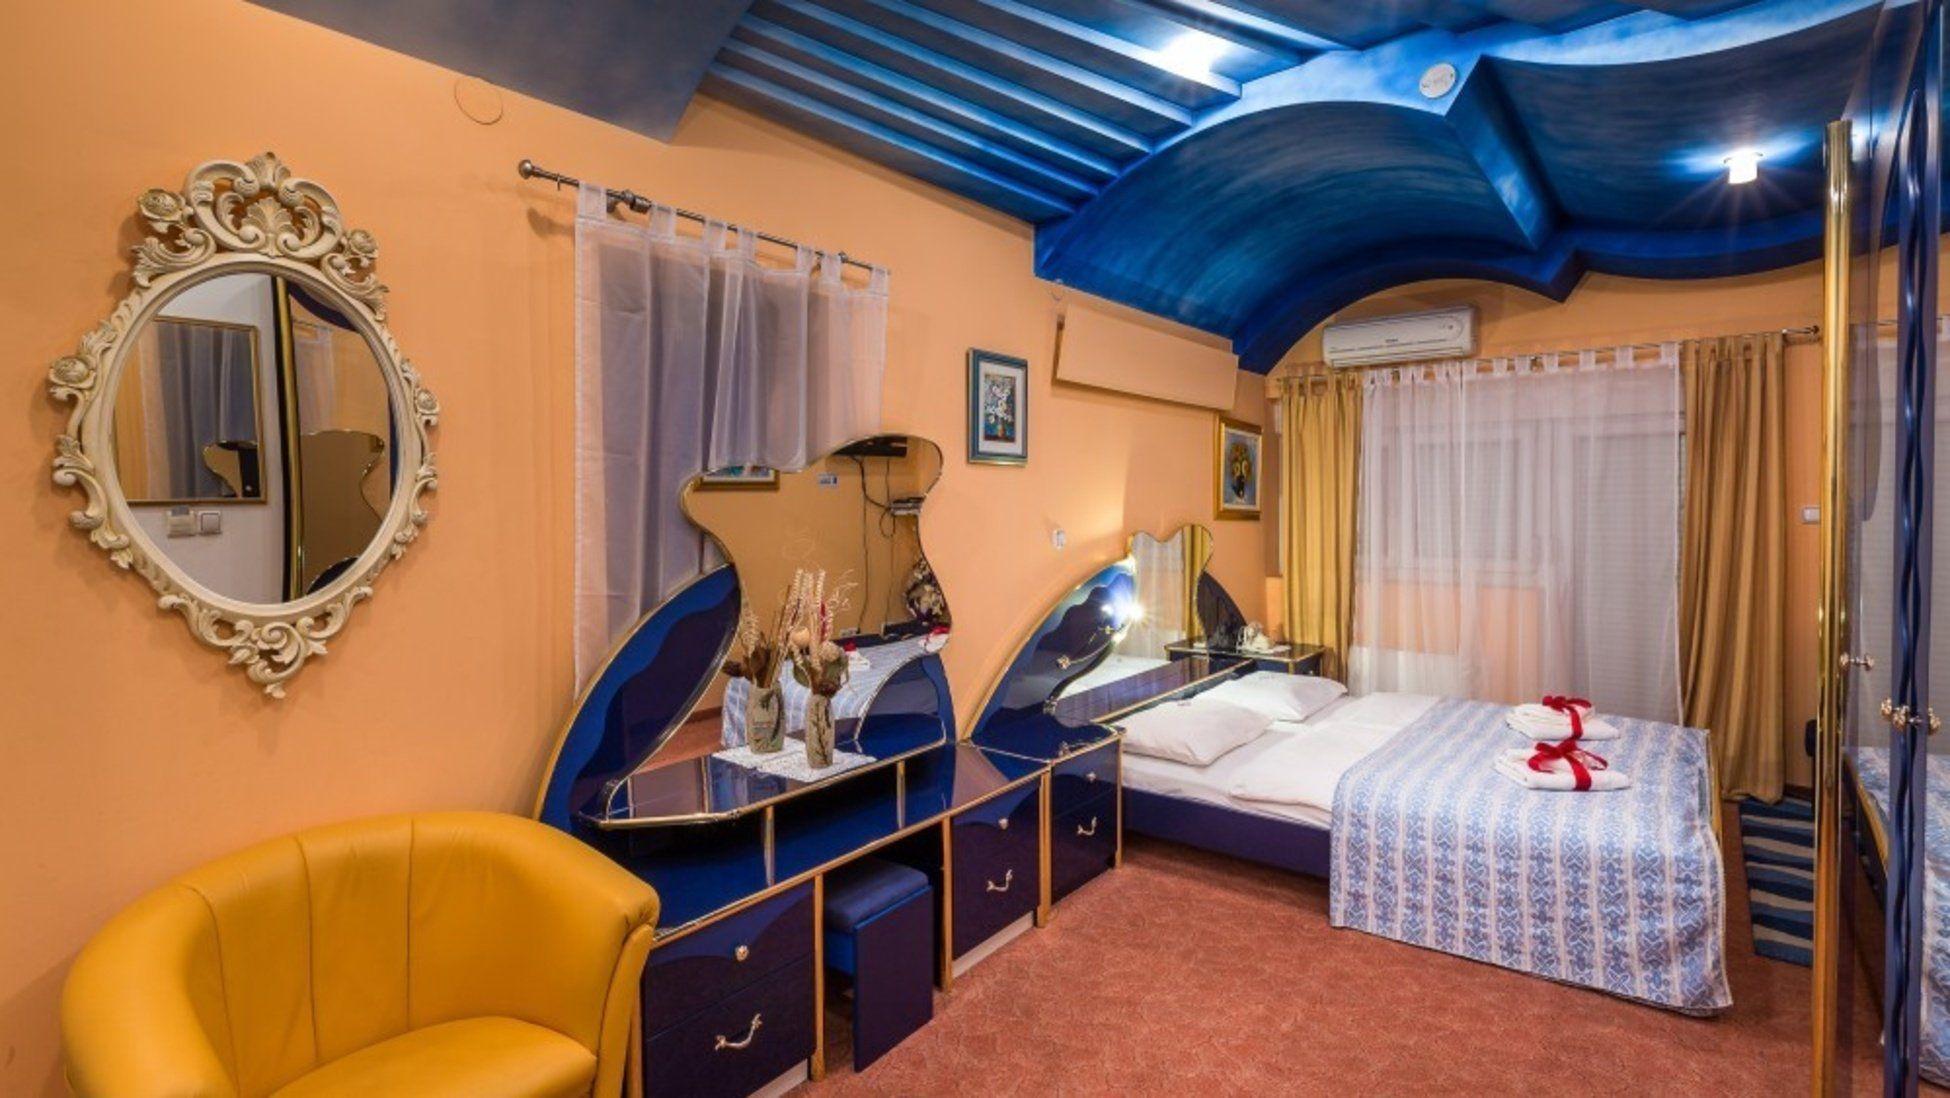 Kroatien Zagreb Kaufe 4 * Hotel Immobilie EfG 11732K